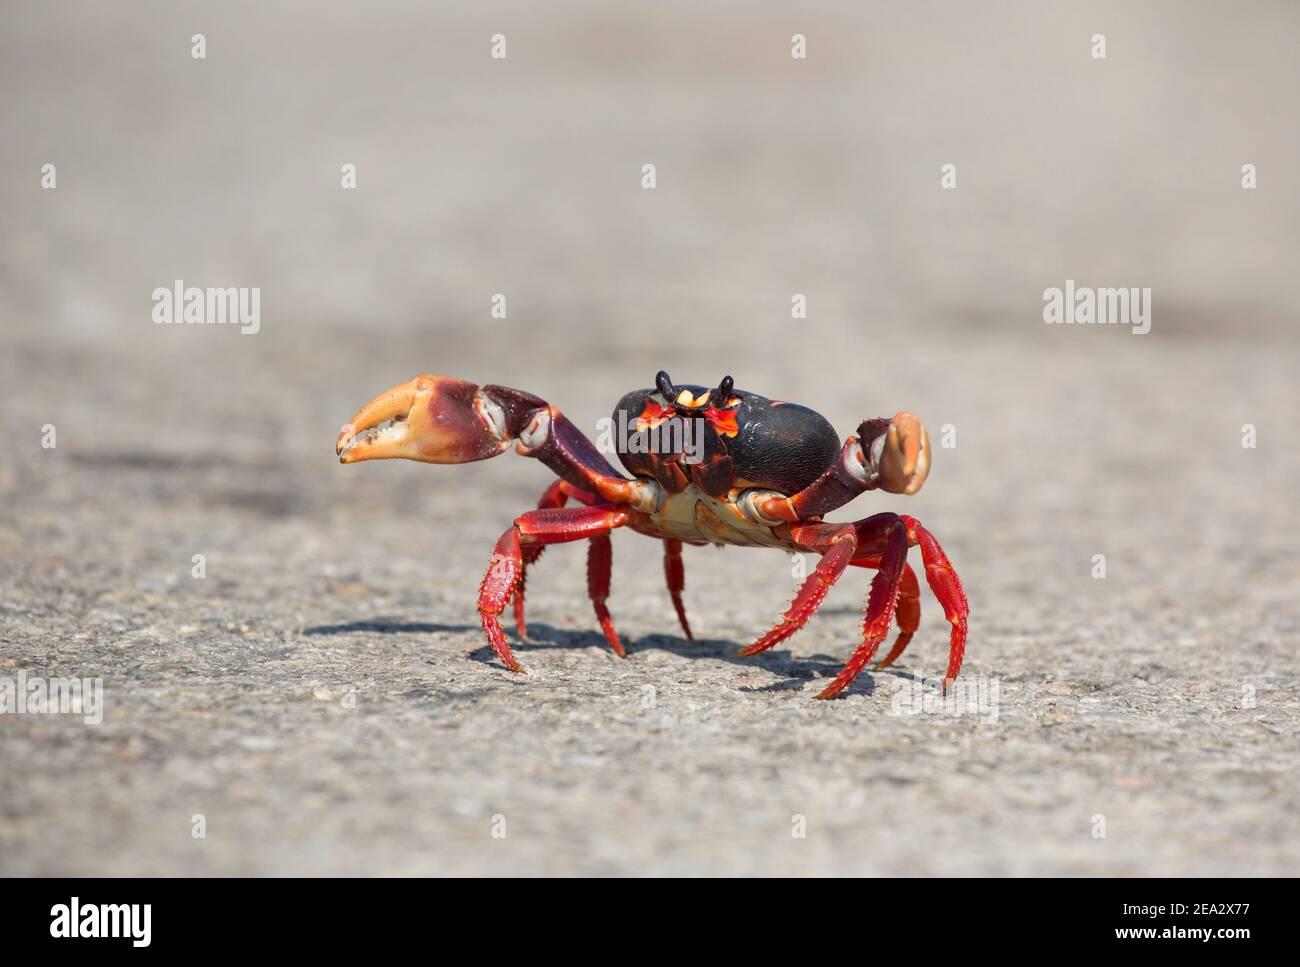 Cuban Land Crab, Gecarcinus ruricola, single dark phase adult on road, March, Playa Giron, Zapata, Cuba Stock Photo